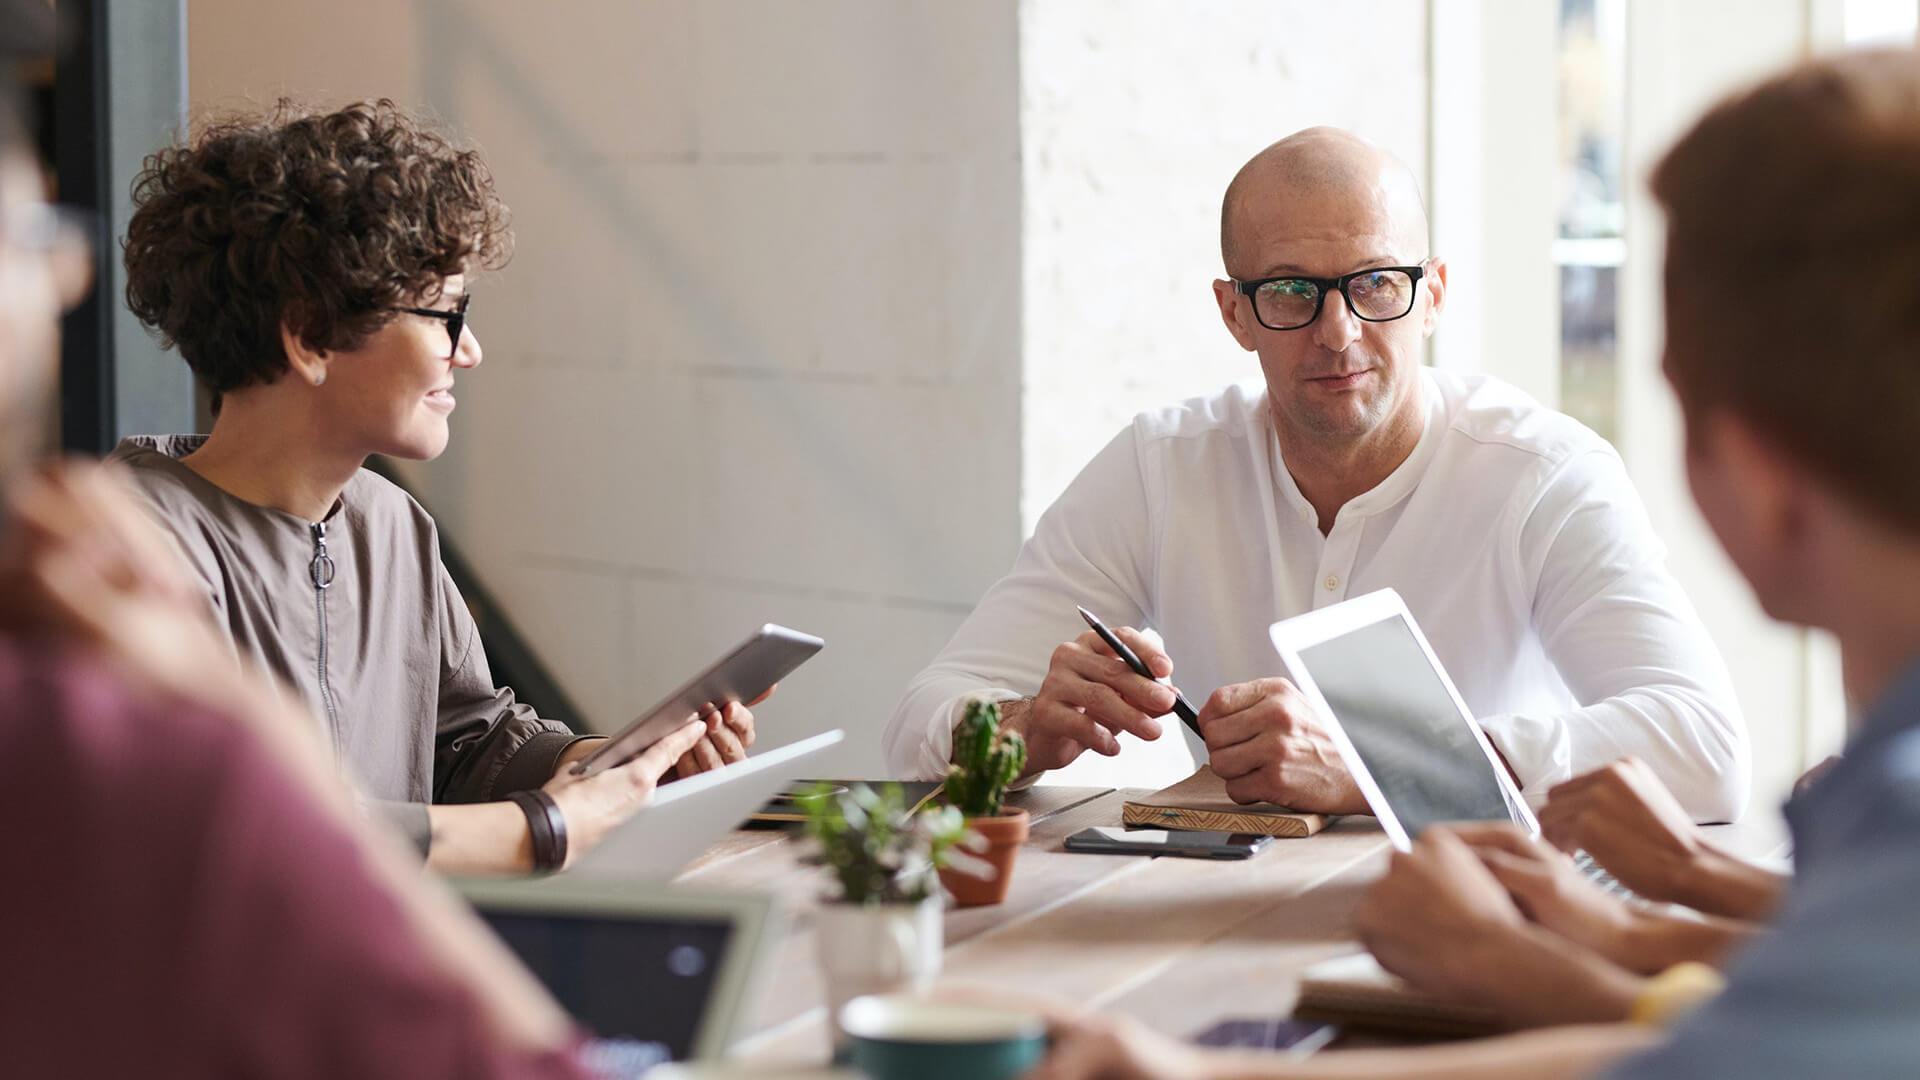 team-meeting-group-talk-decision-people_1920x1080